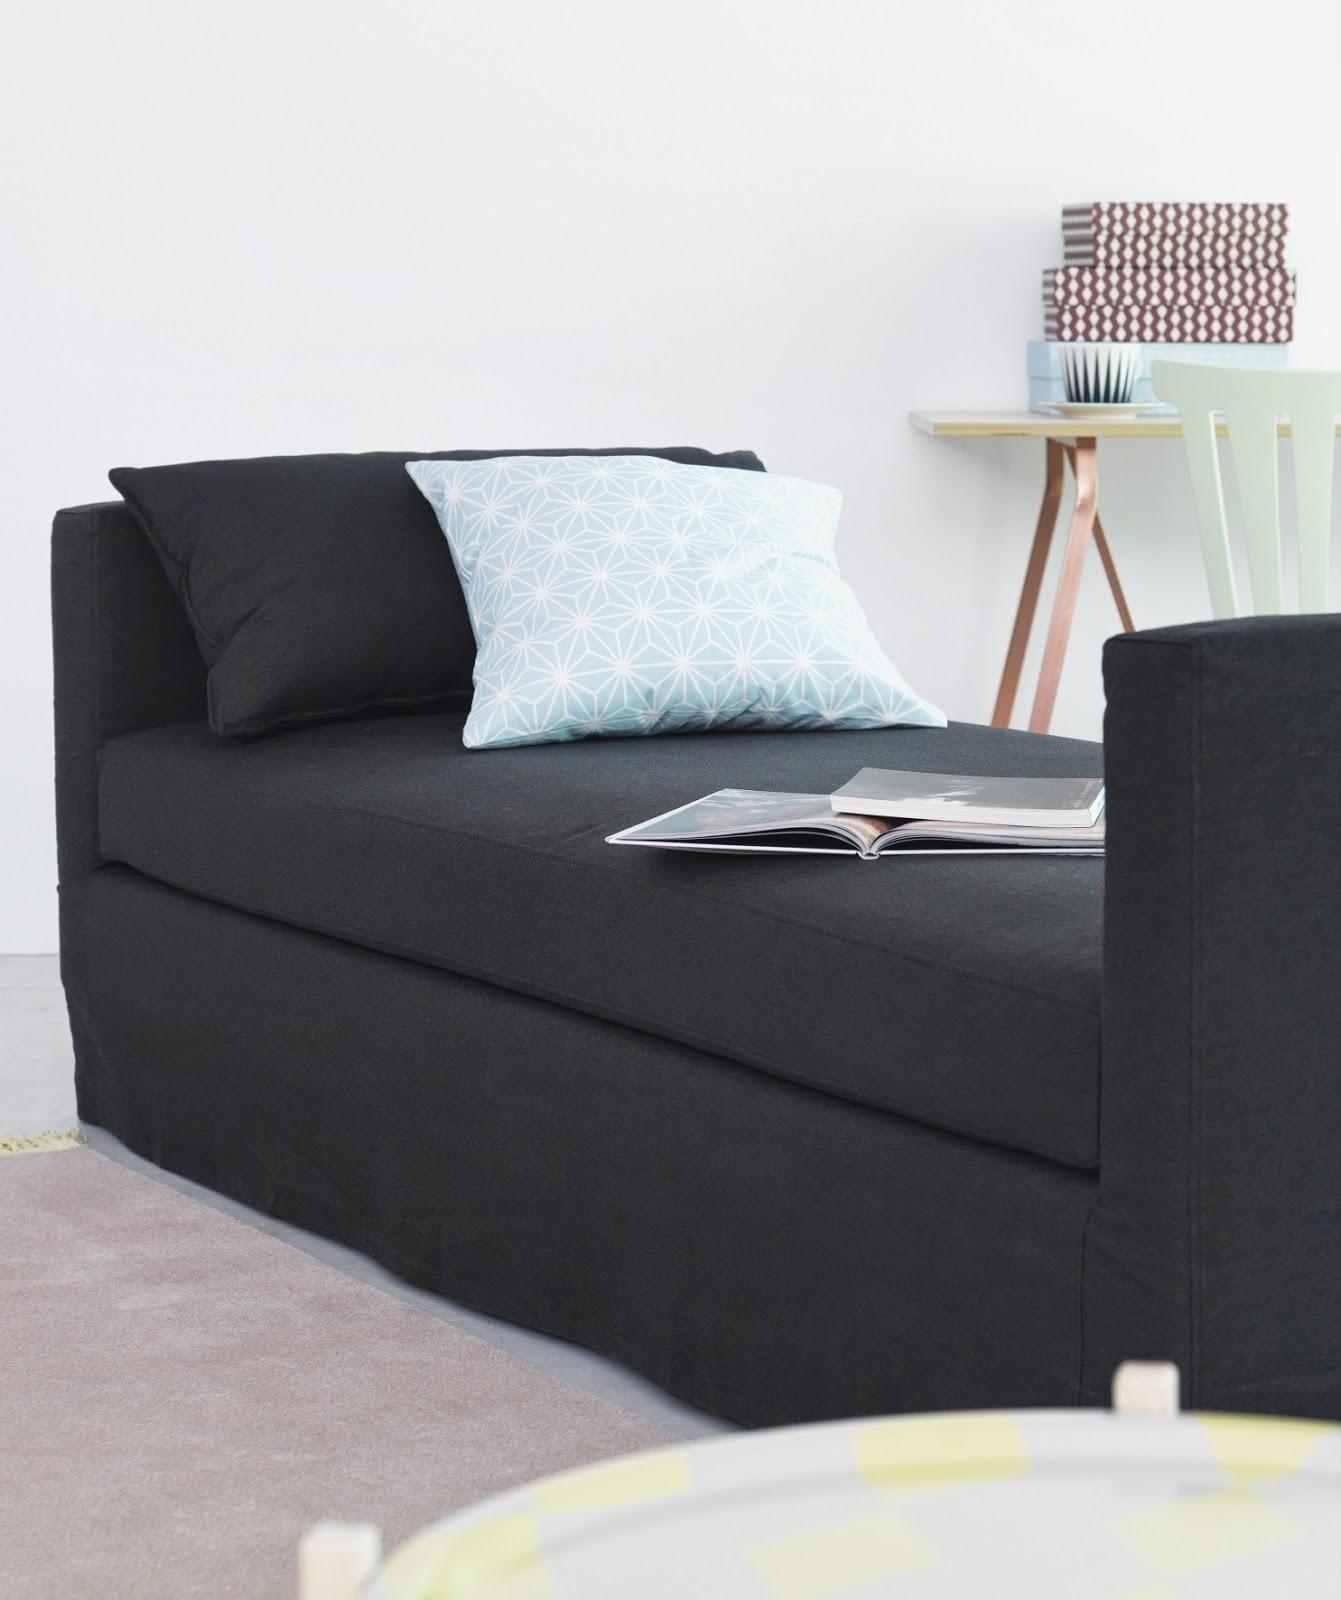 oui oui ikea news limited collection br kig. Black Bedroom Furniture Sets. Home Design Ideas